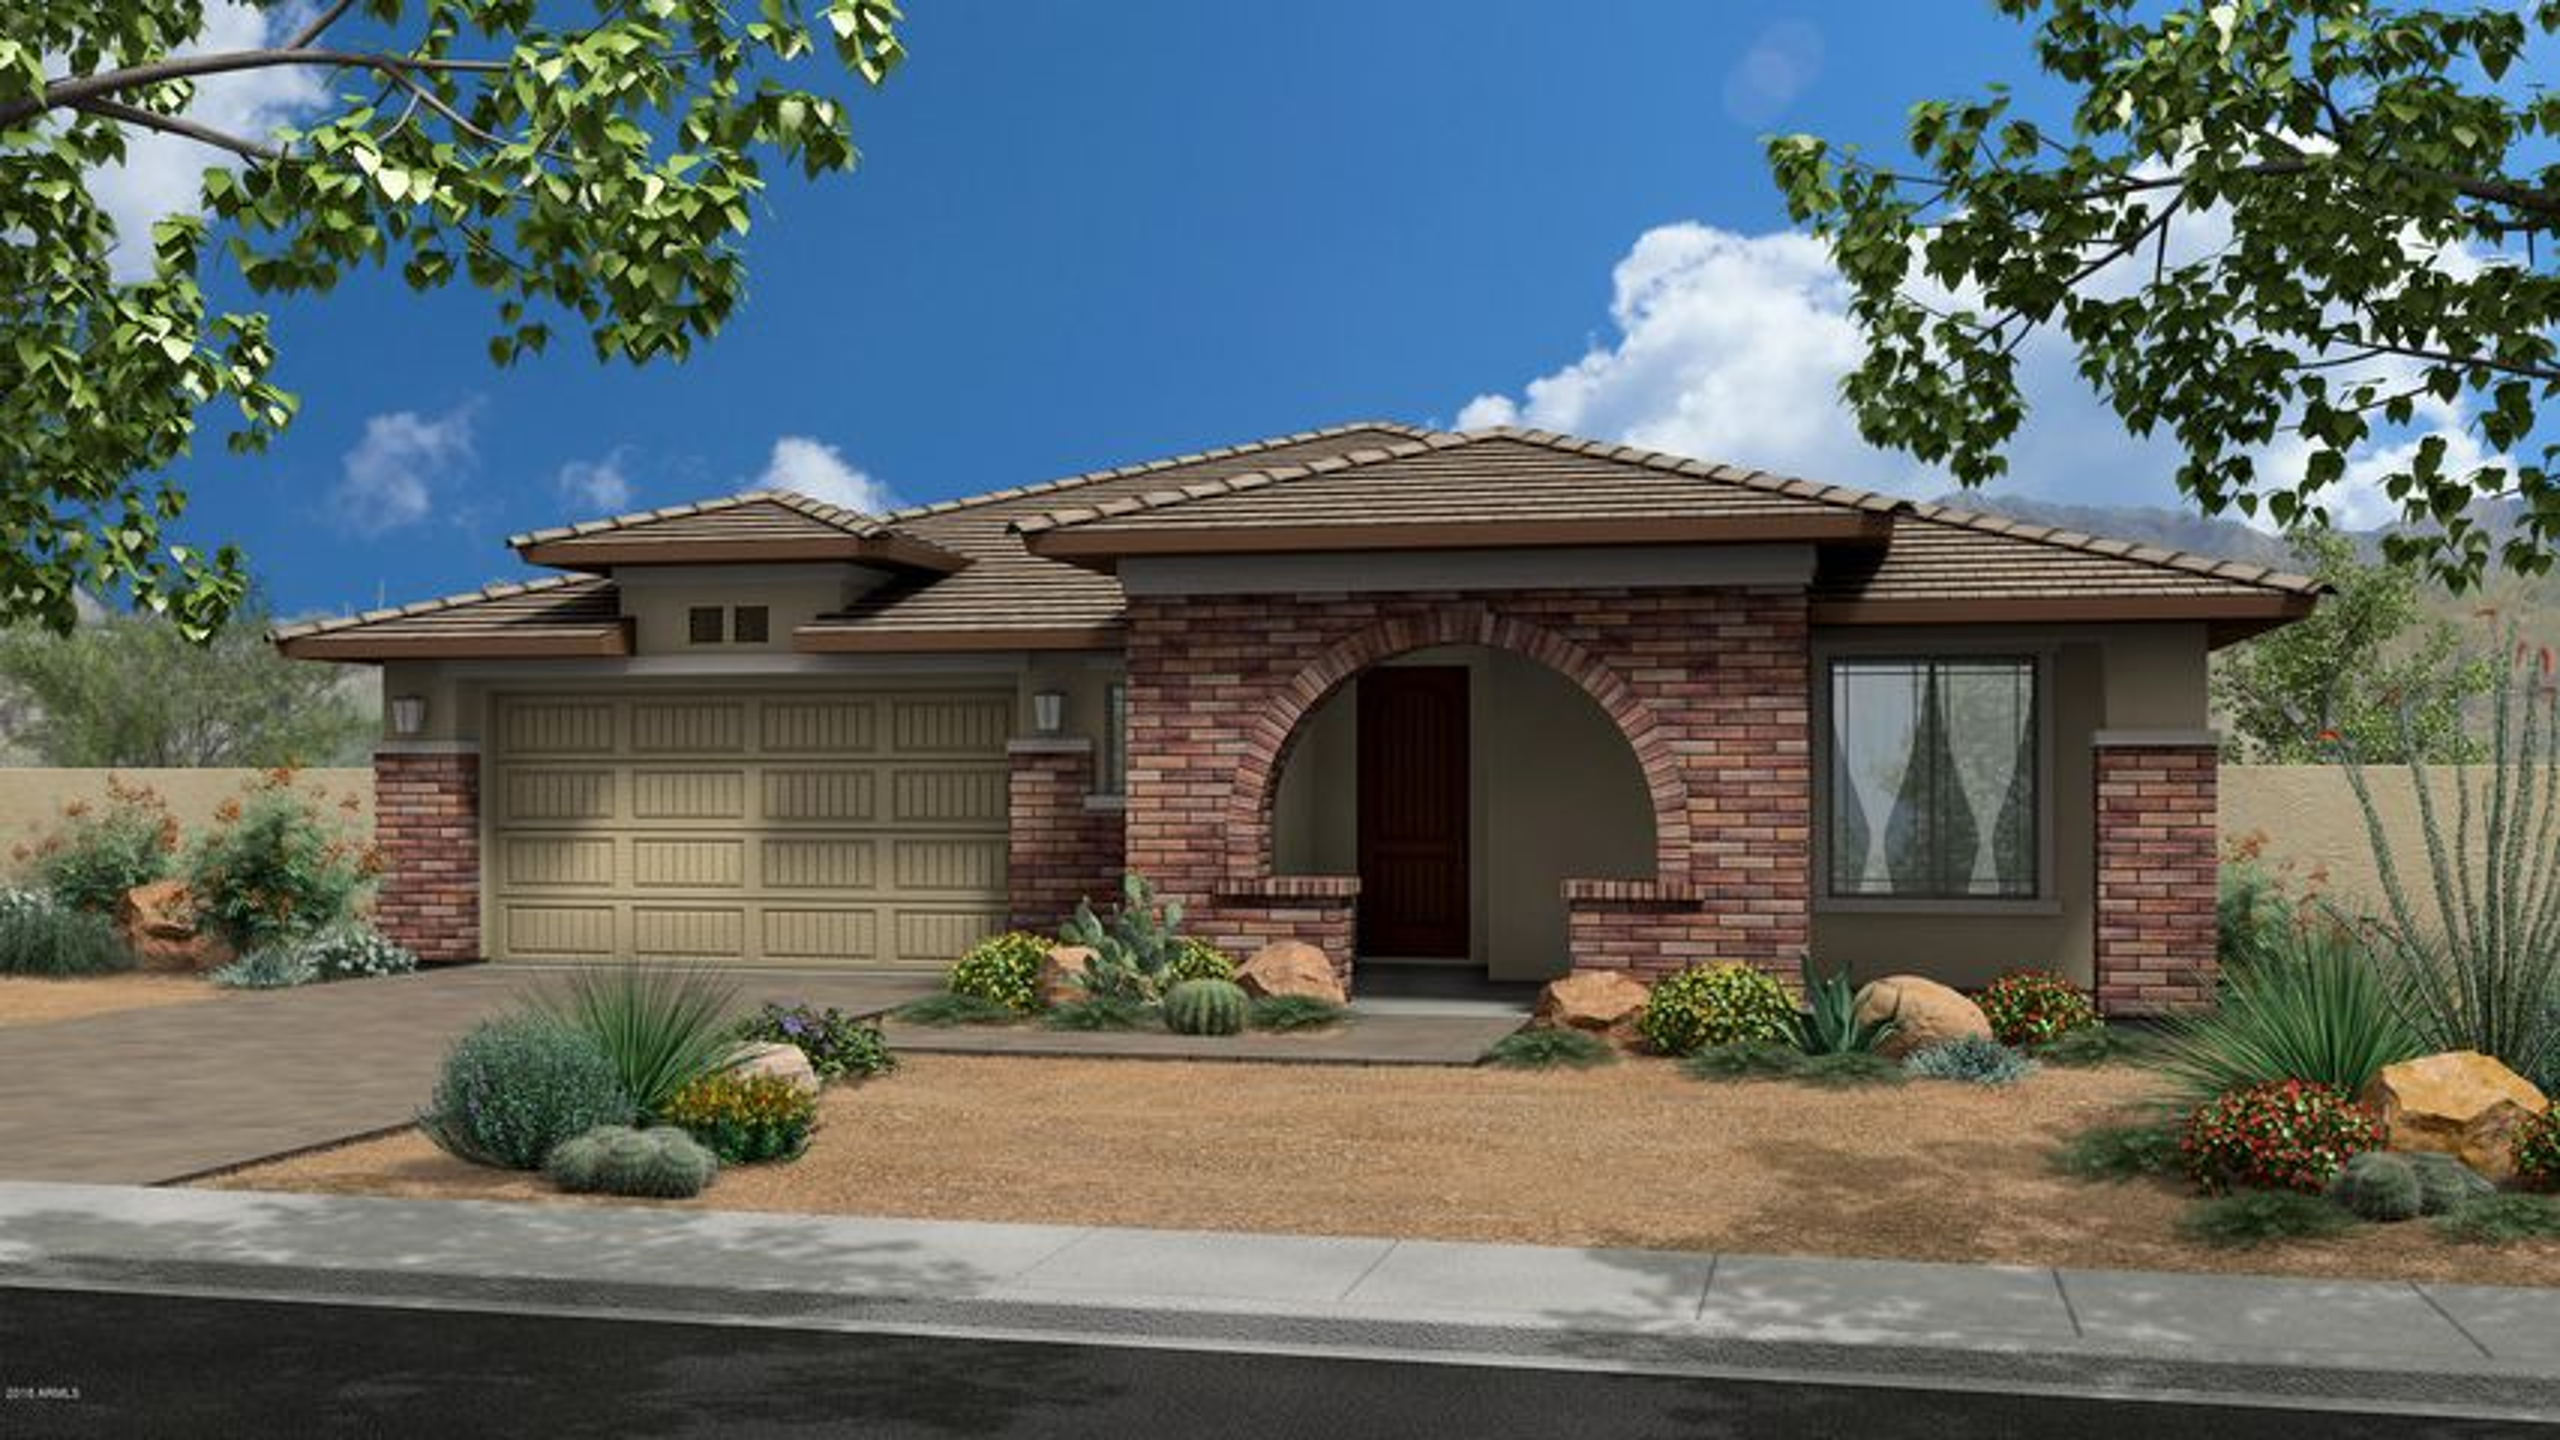 5710 S WINCHESTER, Mesa, AZ 85212